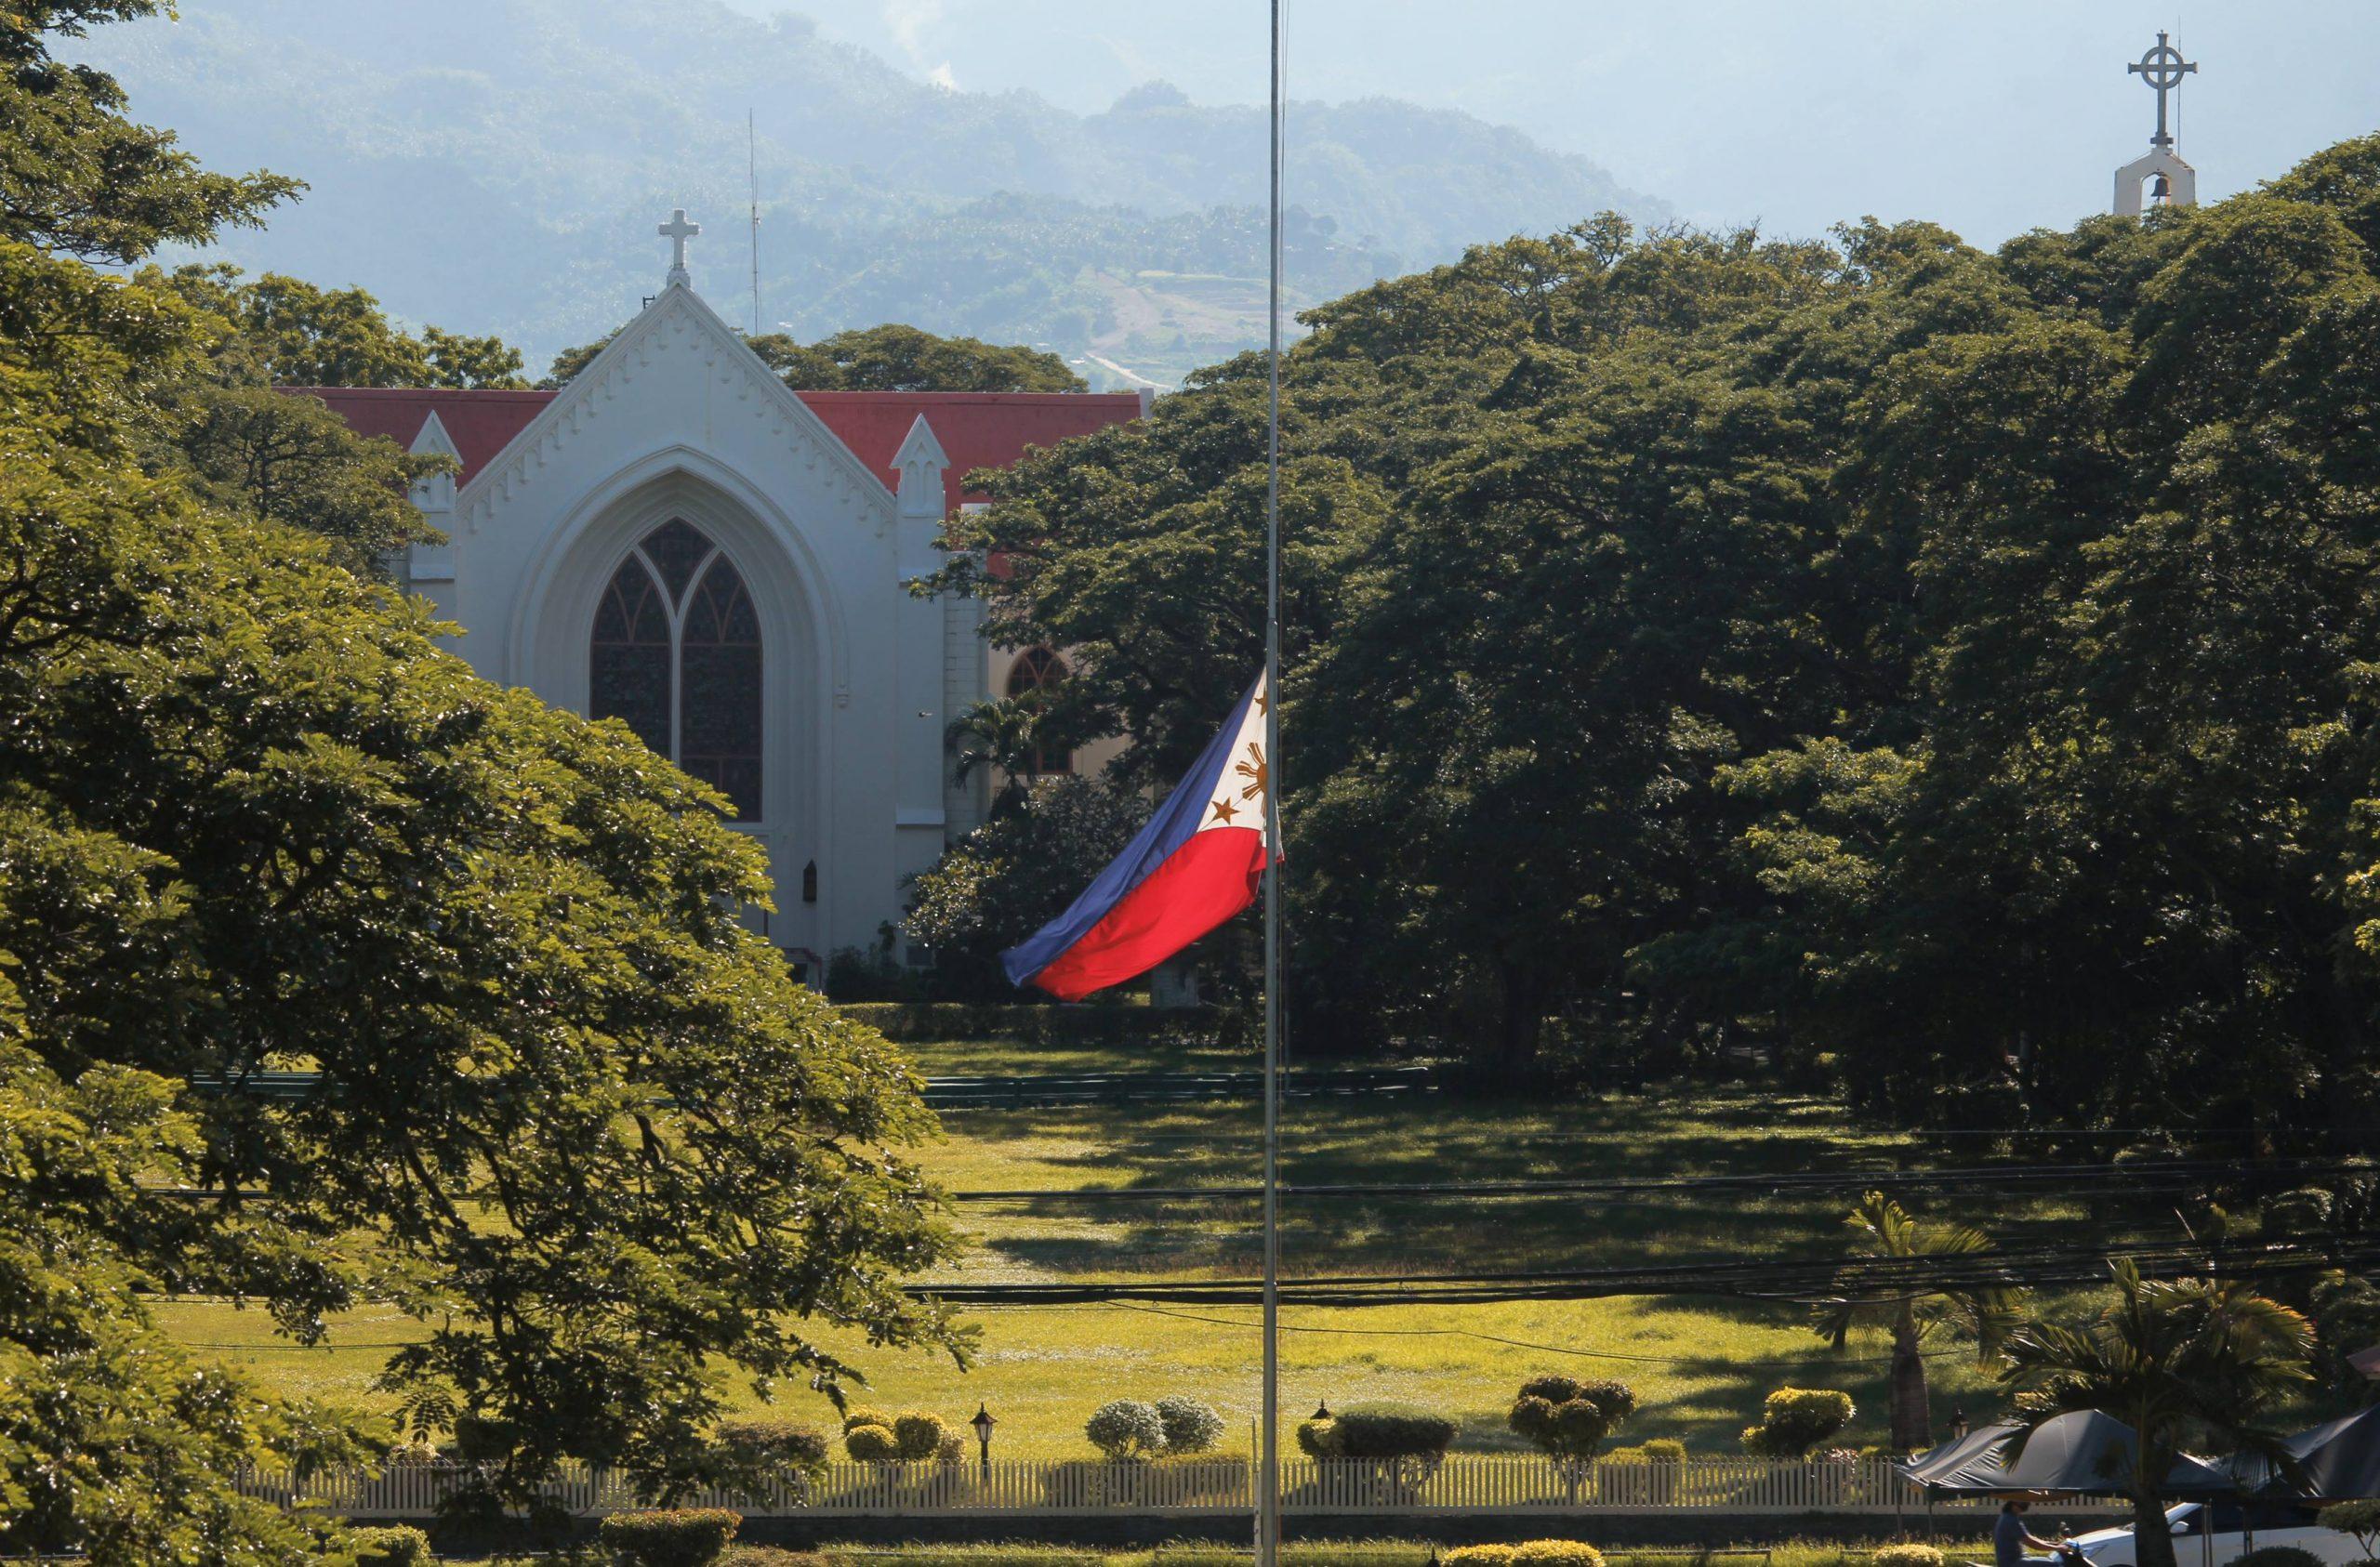 Statement on the Passing of Former Philippine President Benigno Aquino III